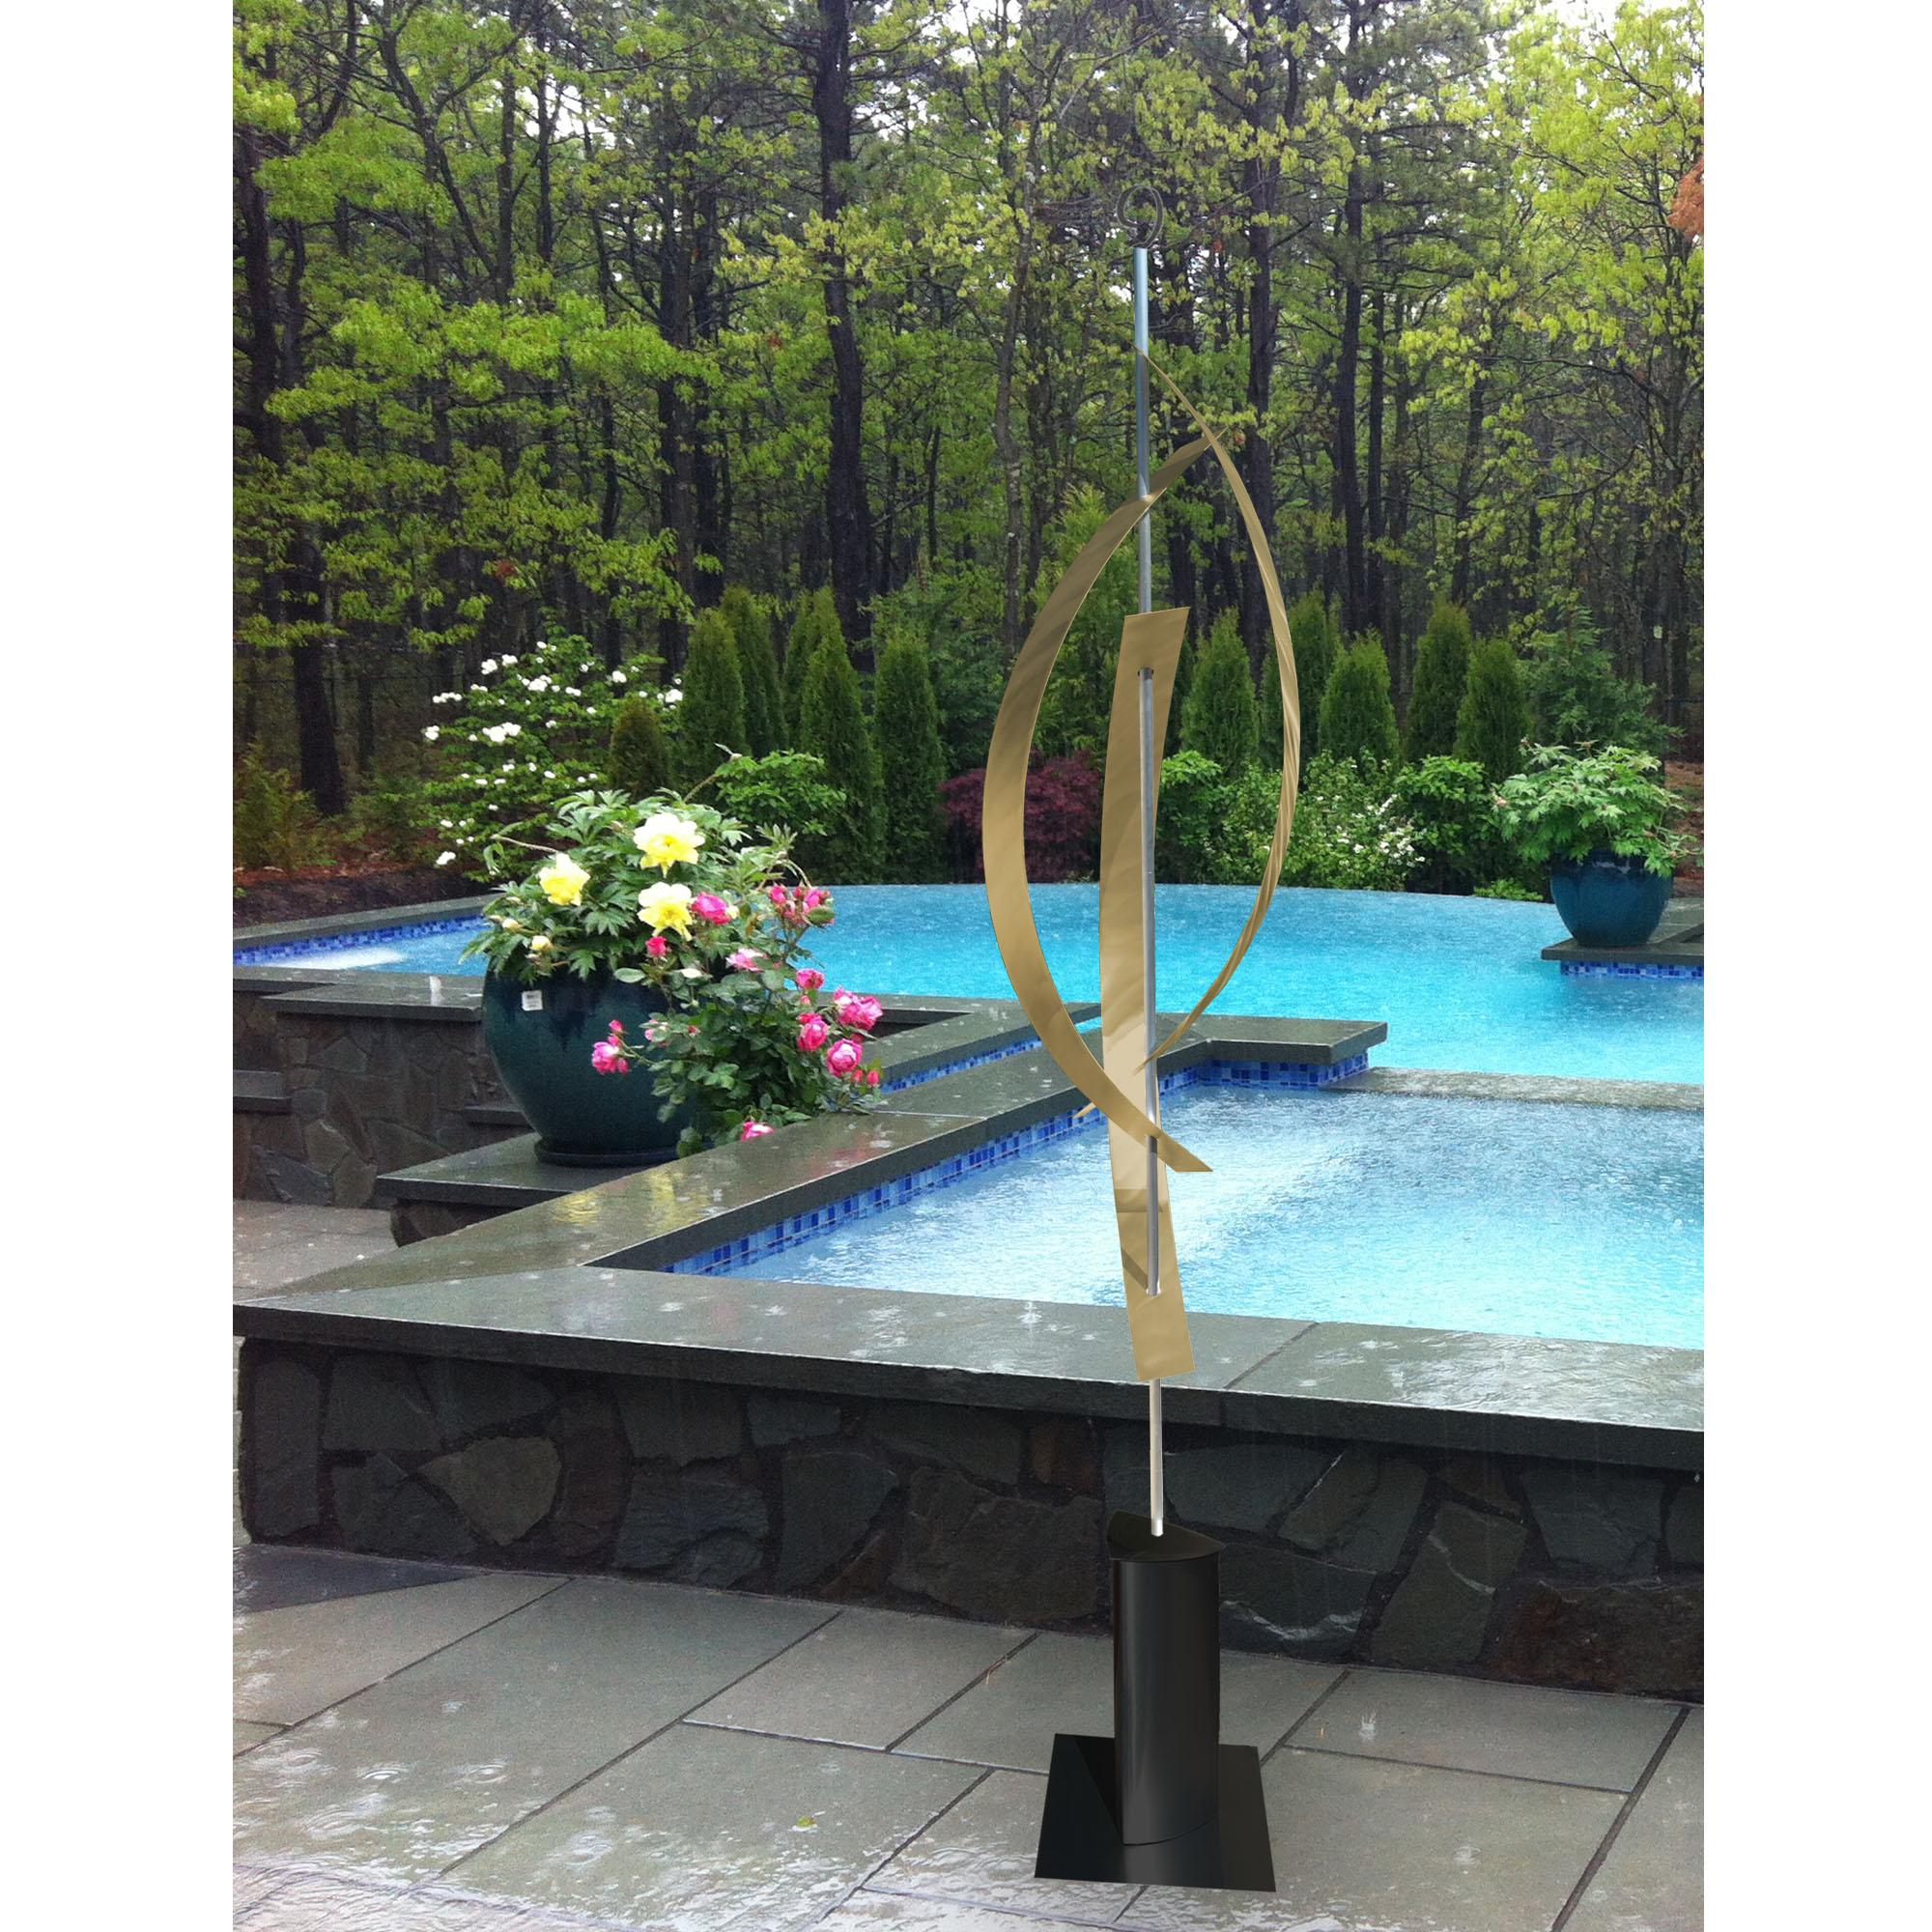 Orion Copper Large Metal Sculpture Garden Art Poolside